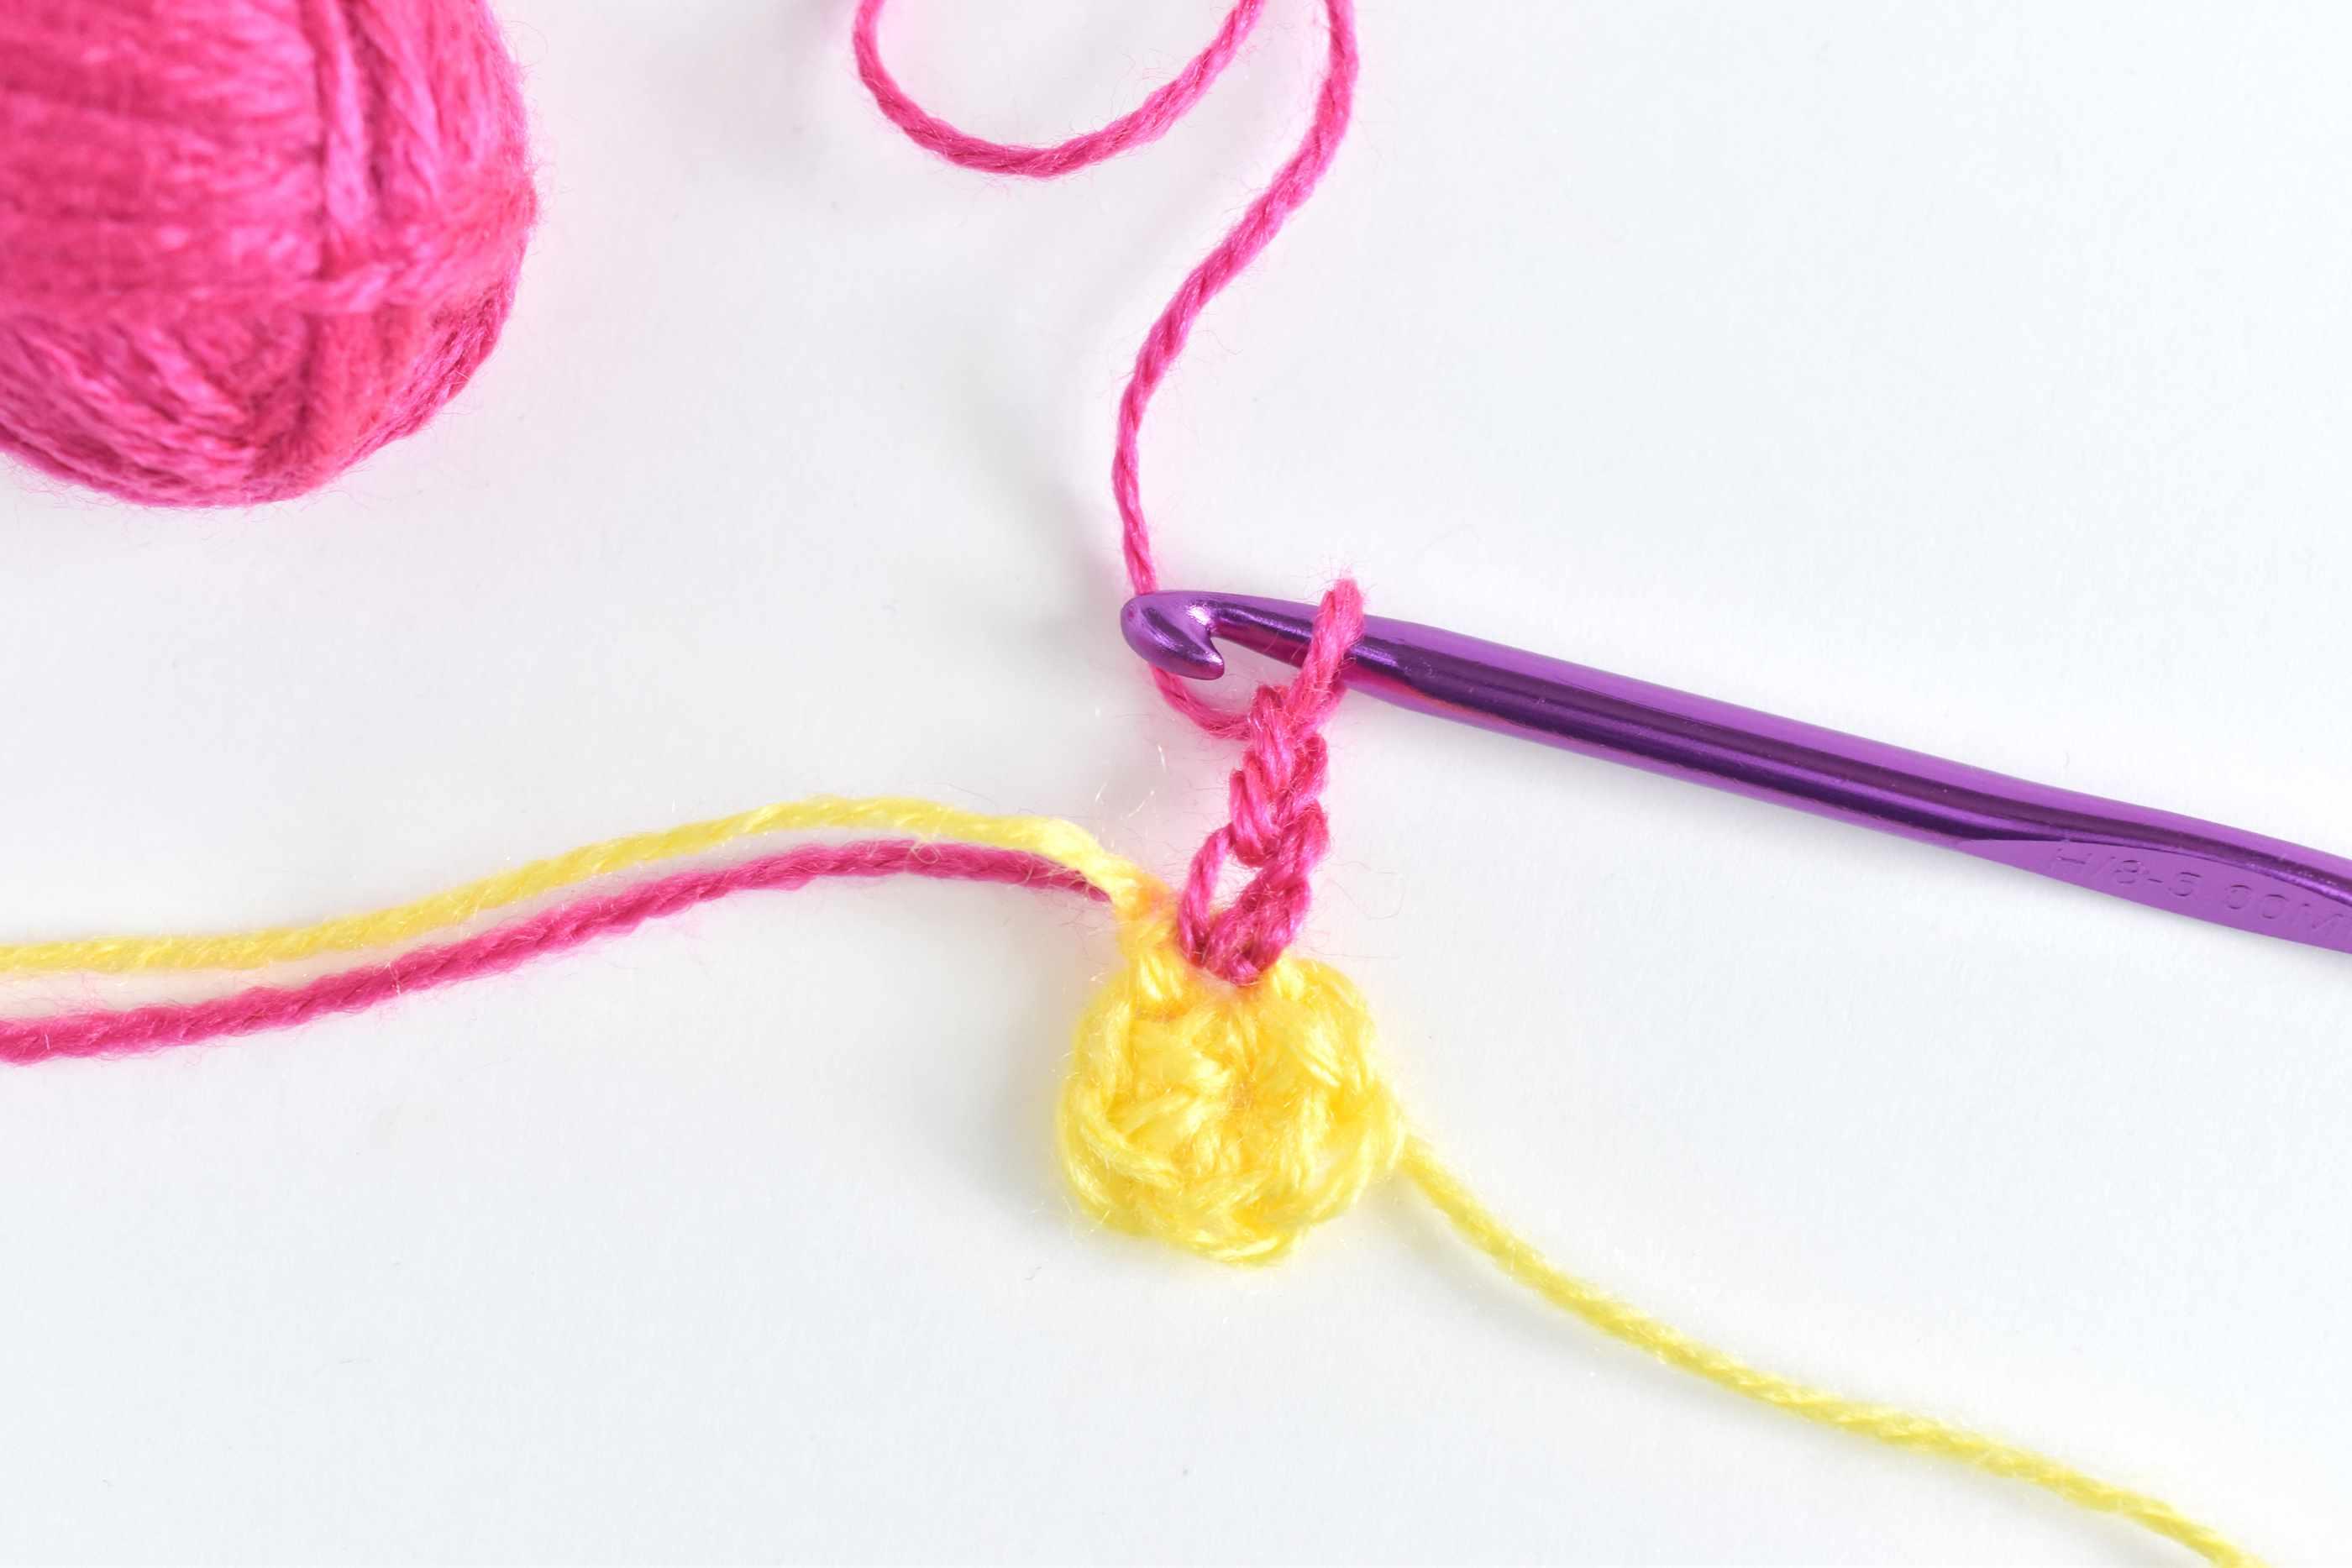 Chain 3 to start a puff stitch petal